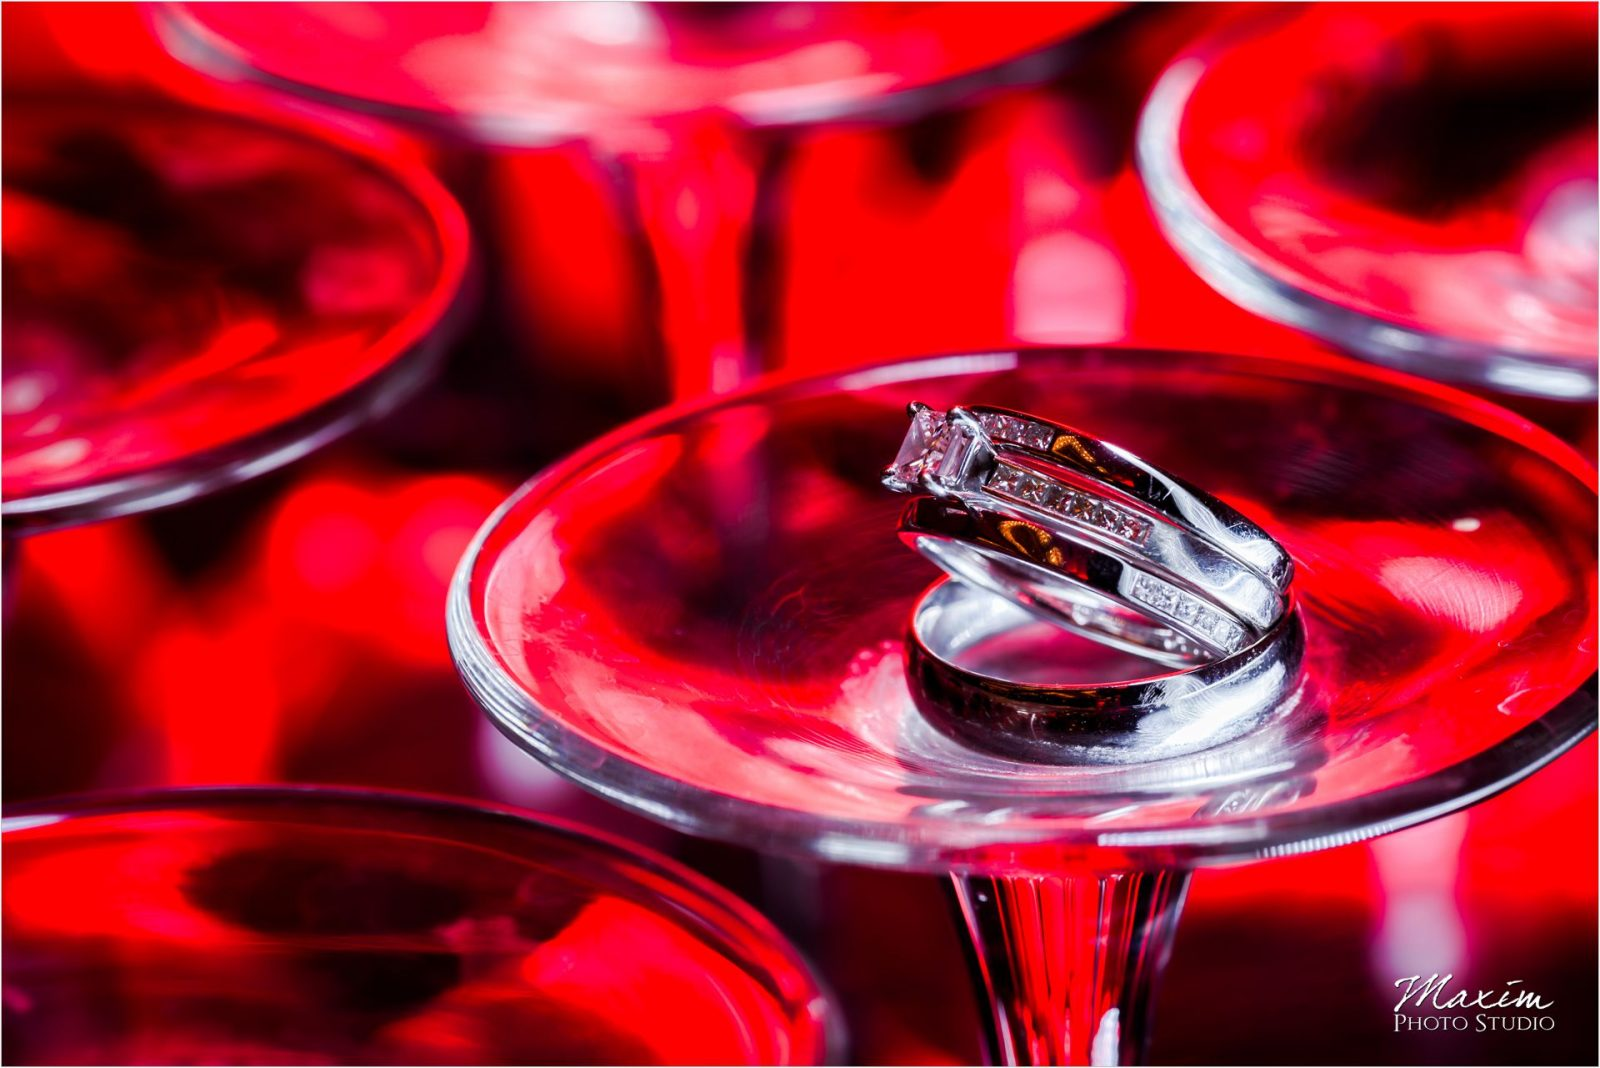 Hyatt Cincinnati Wedding rings